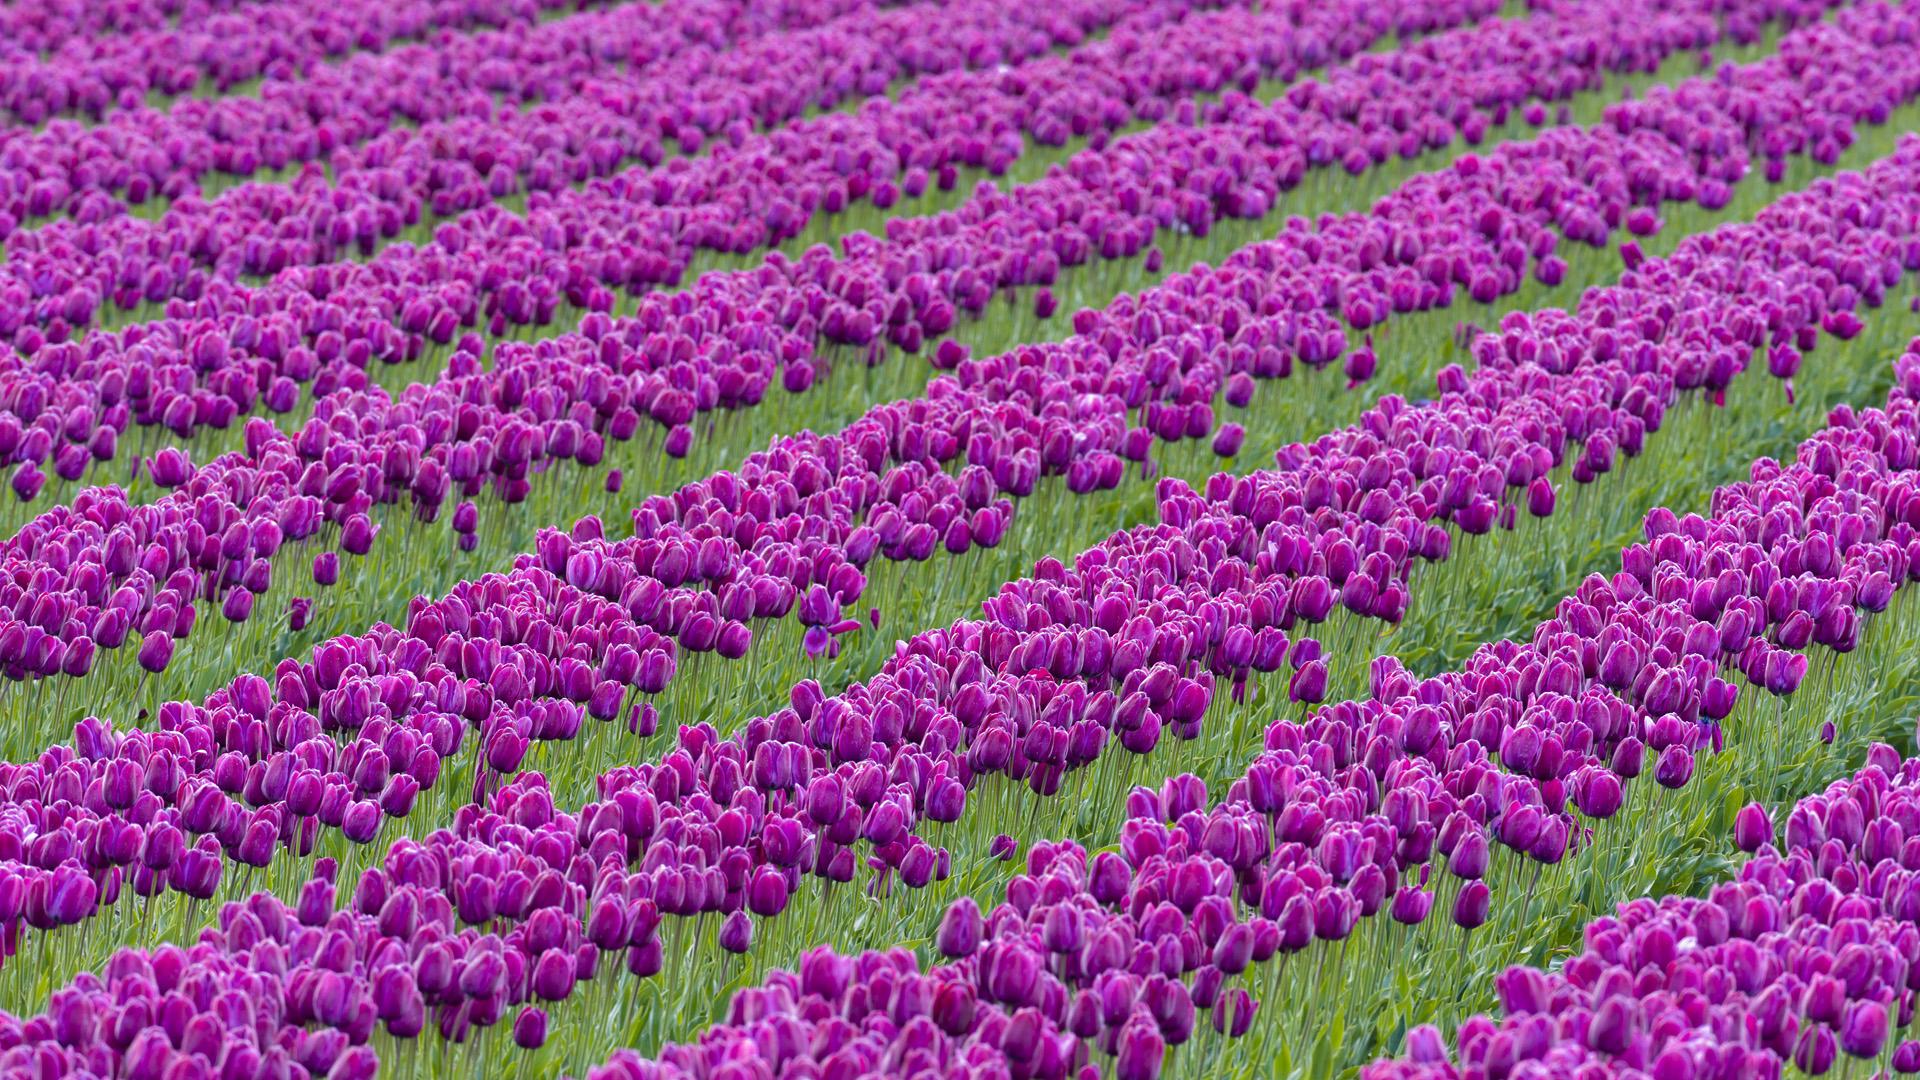 Skagit Valley, Tulip Festival, Washington State, USA